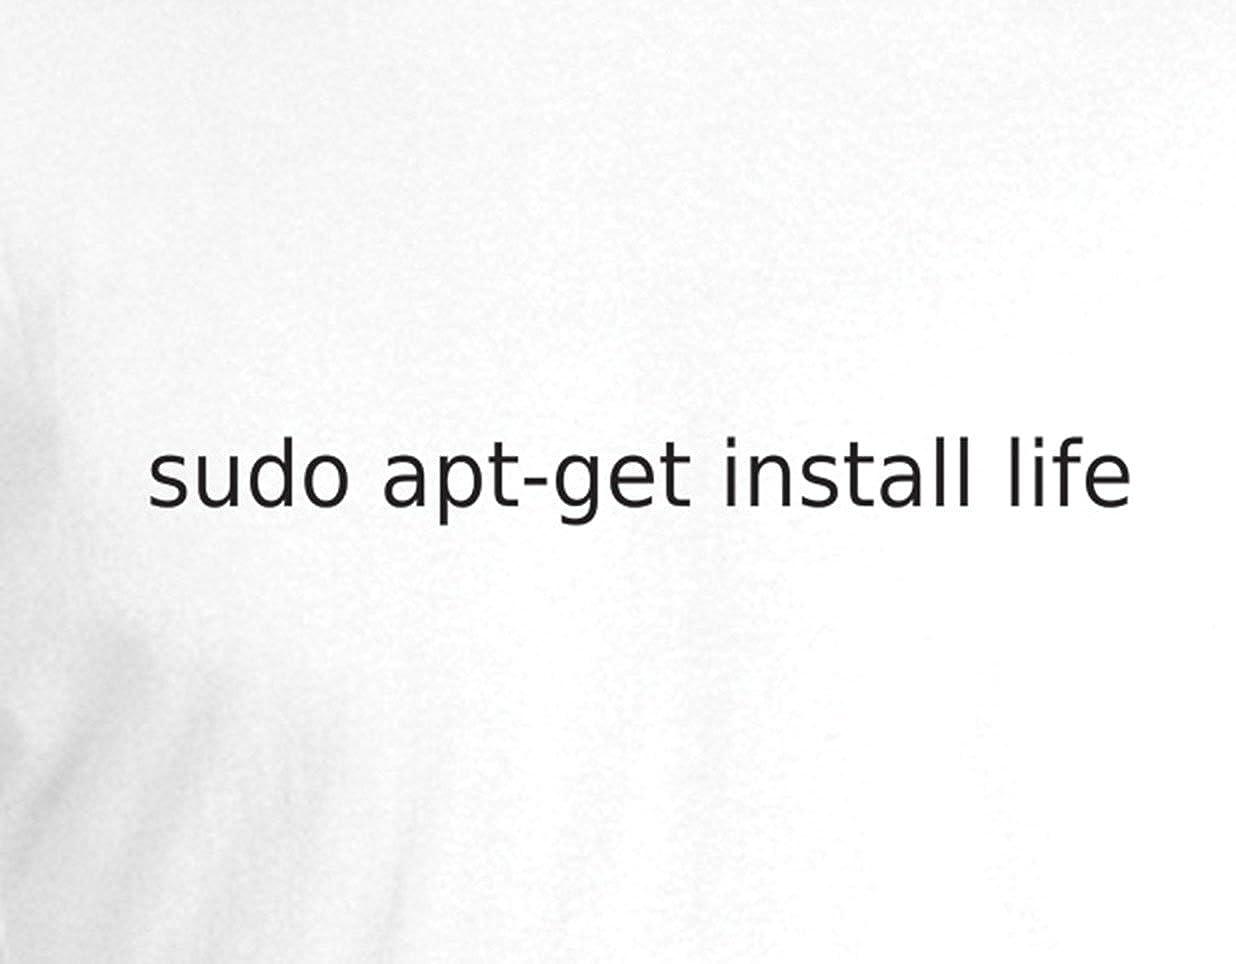 Sudo apt-get Install Life - Sysadmin Linux Ubuntu Debin Geeky Nerdy Techie  Mens T-Shirt